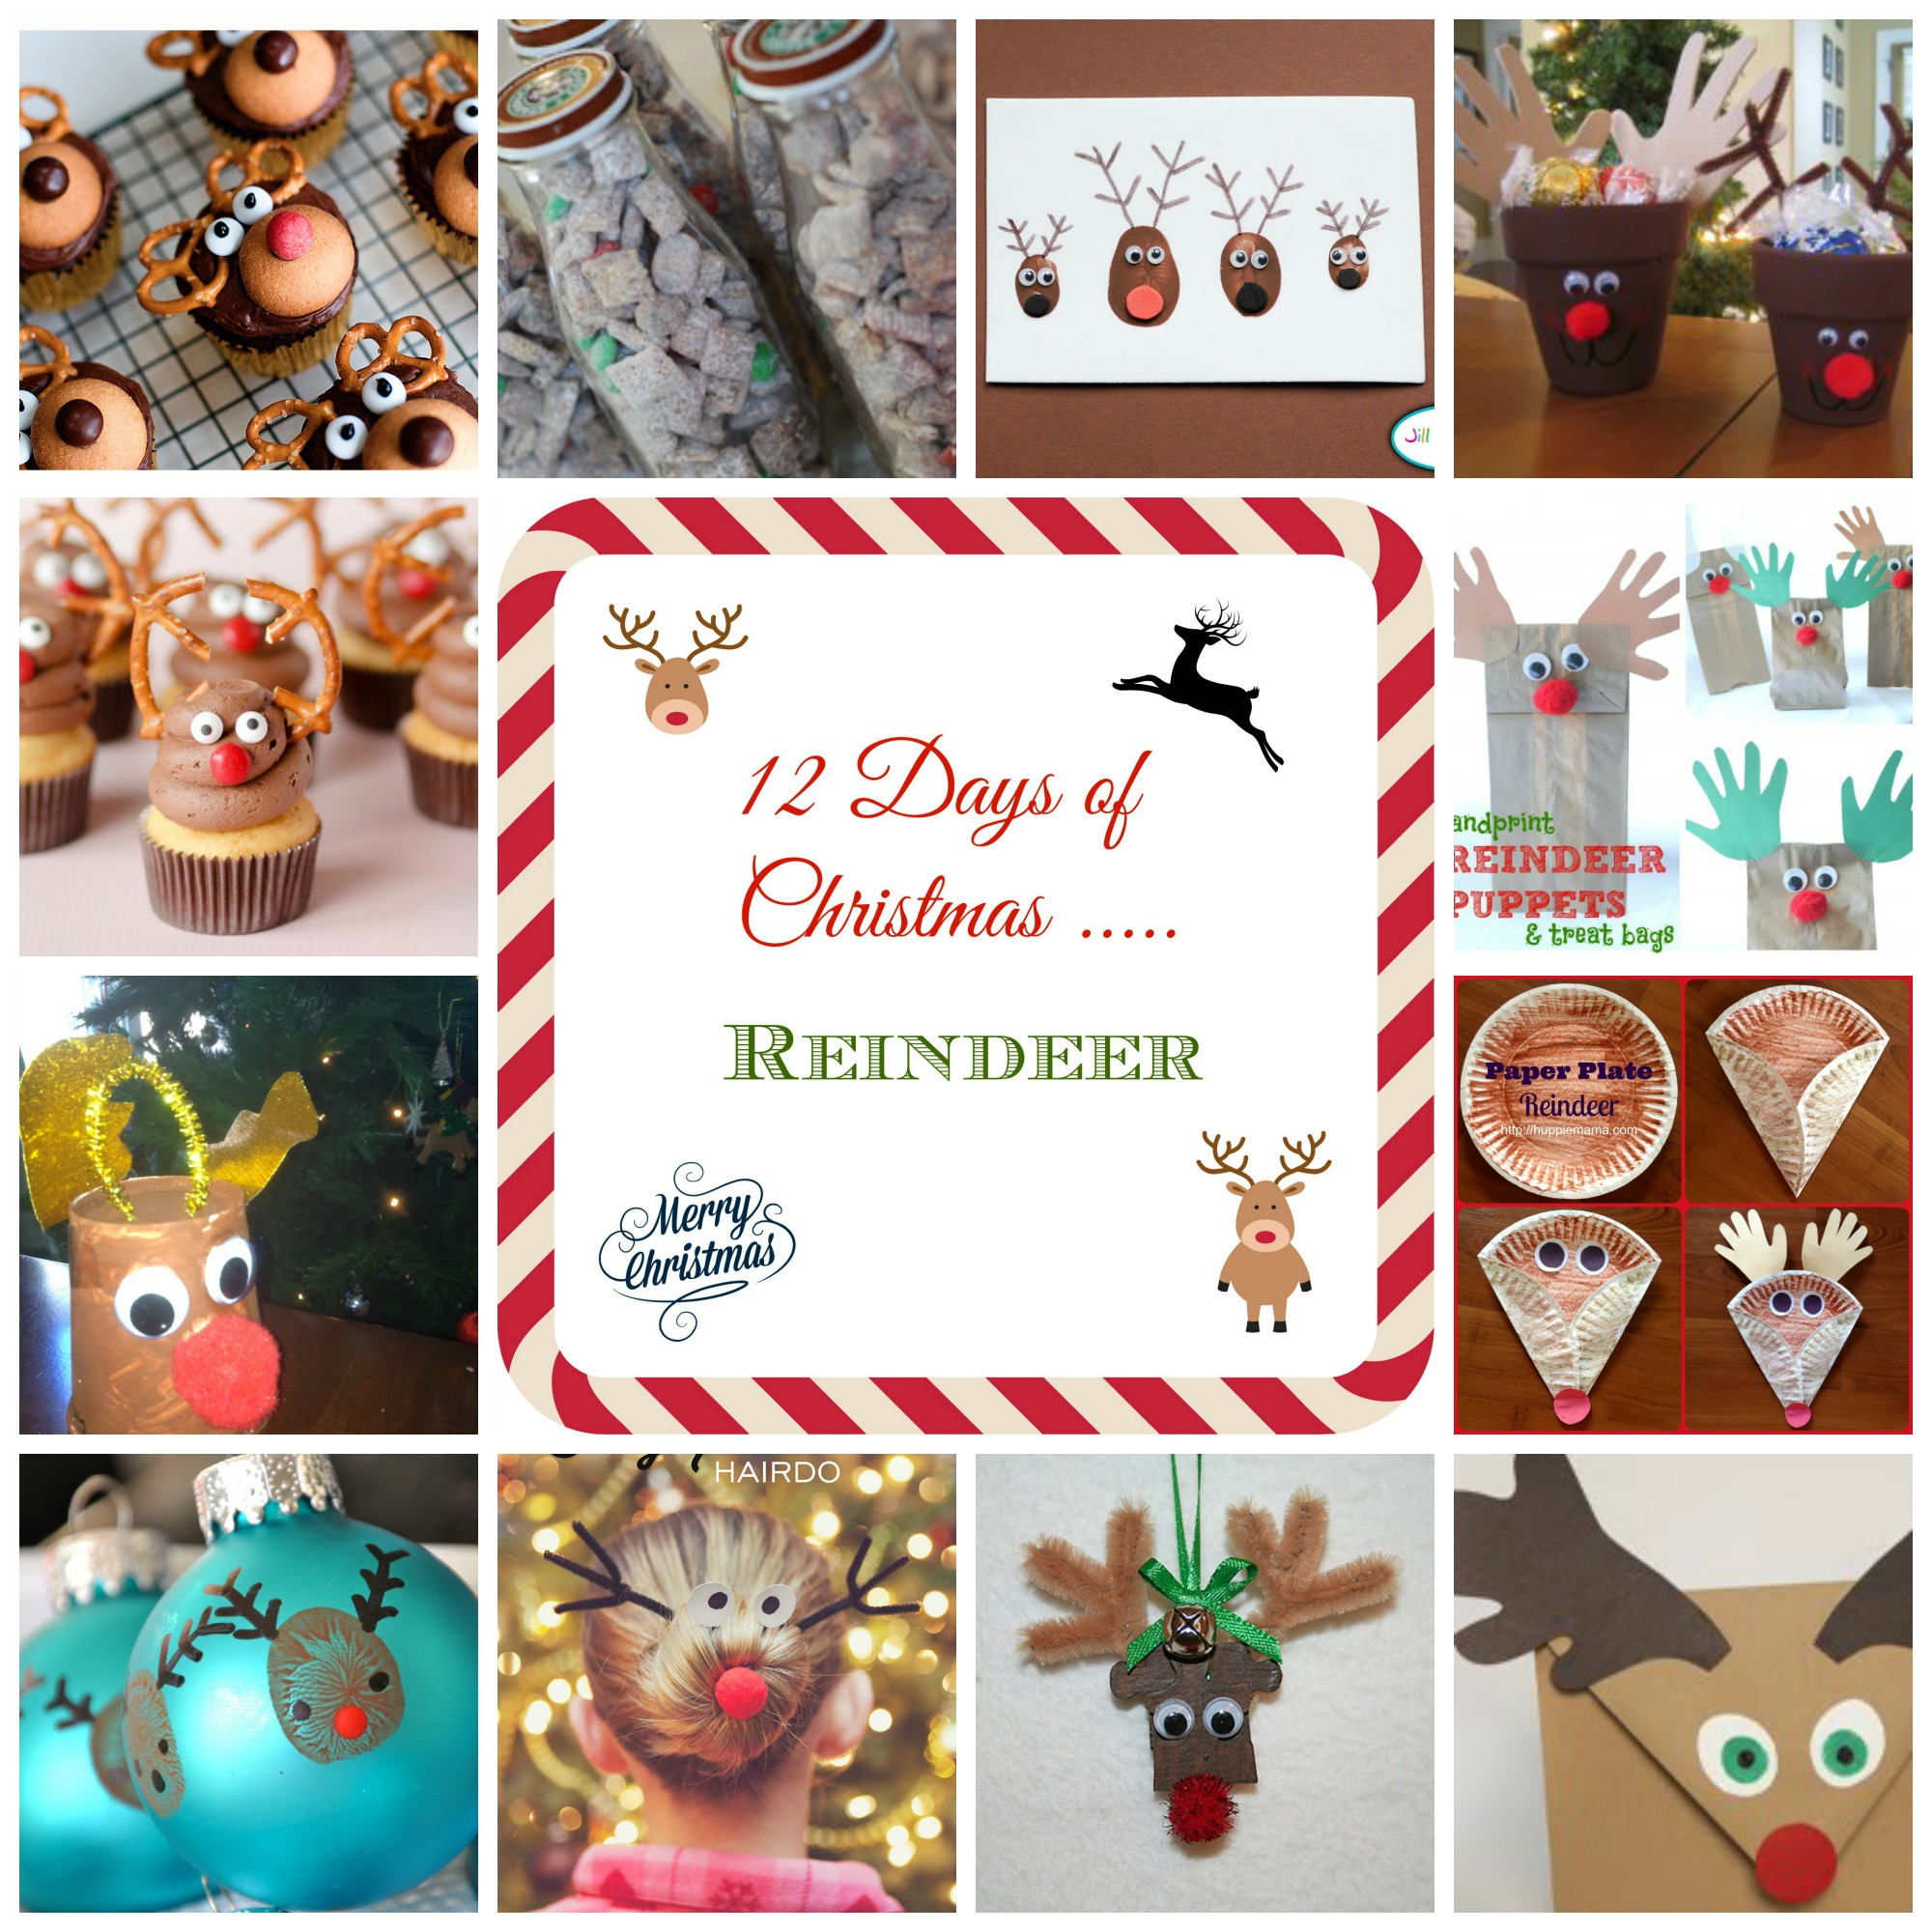 12 Days of Christmas - Reindeer